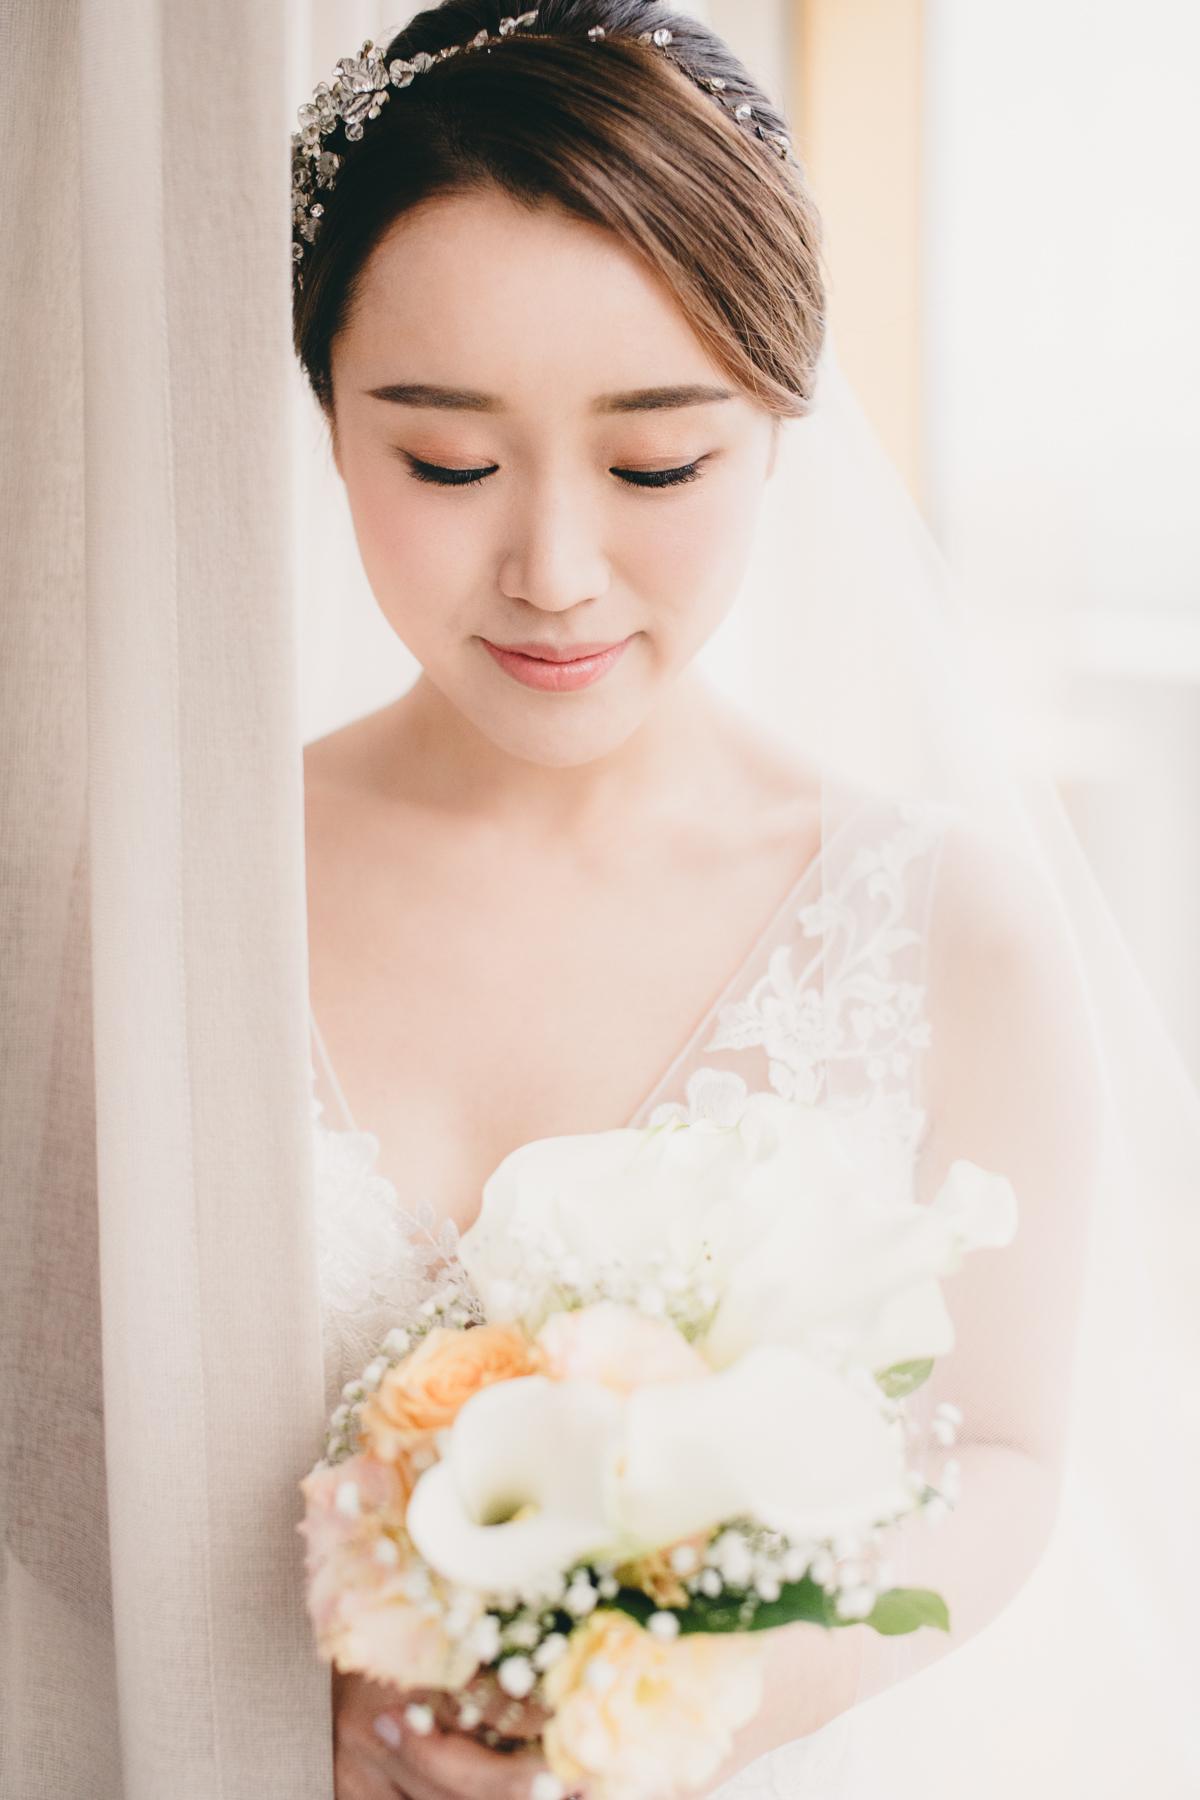 justlimphoto-sungminray-6506.jpg